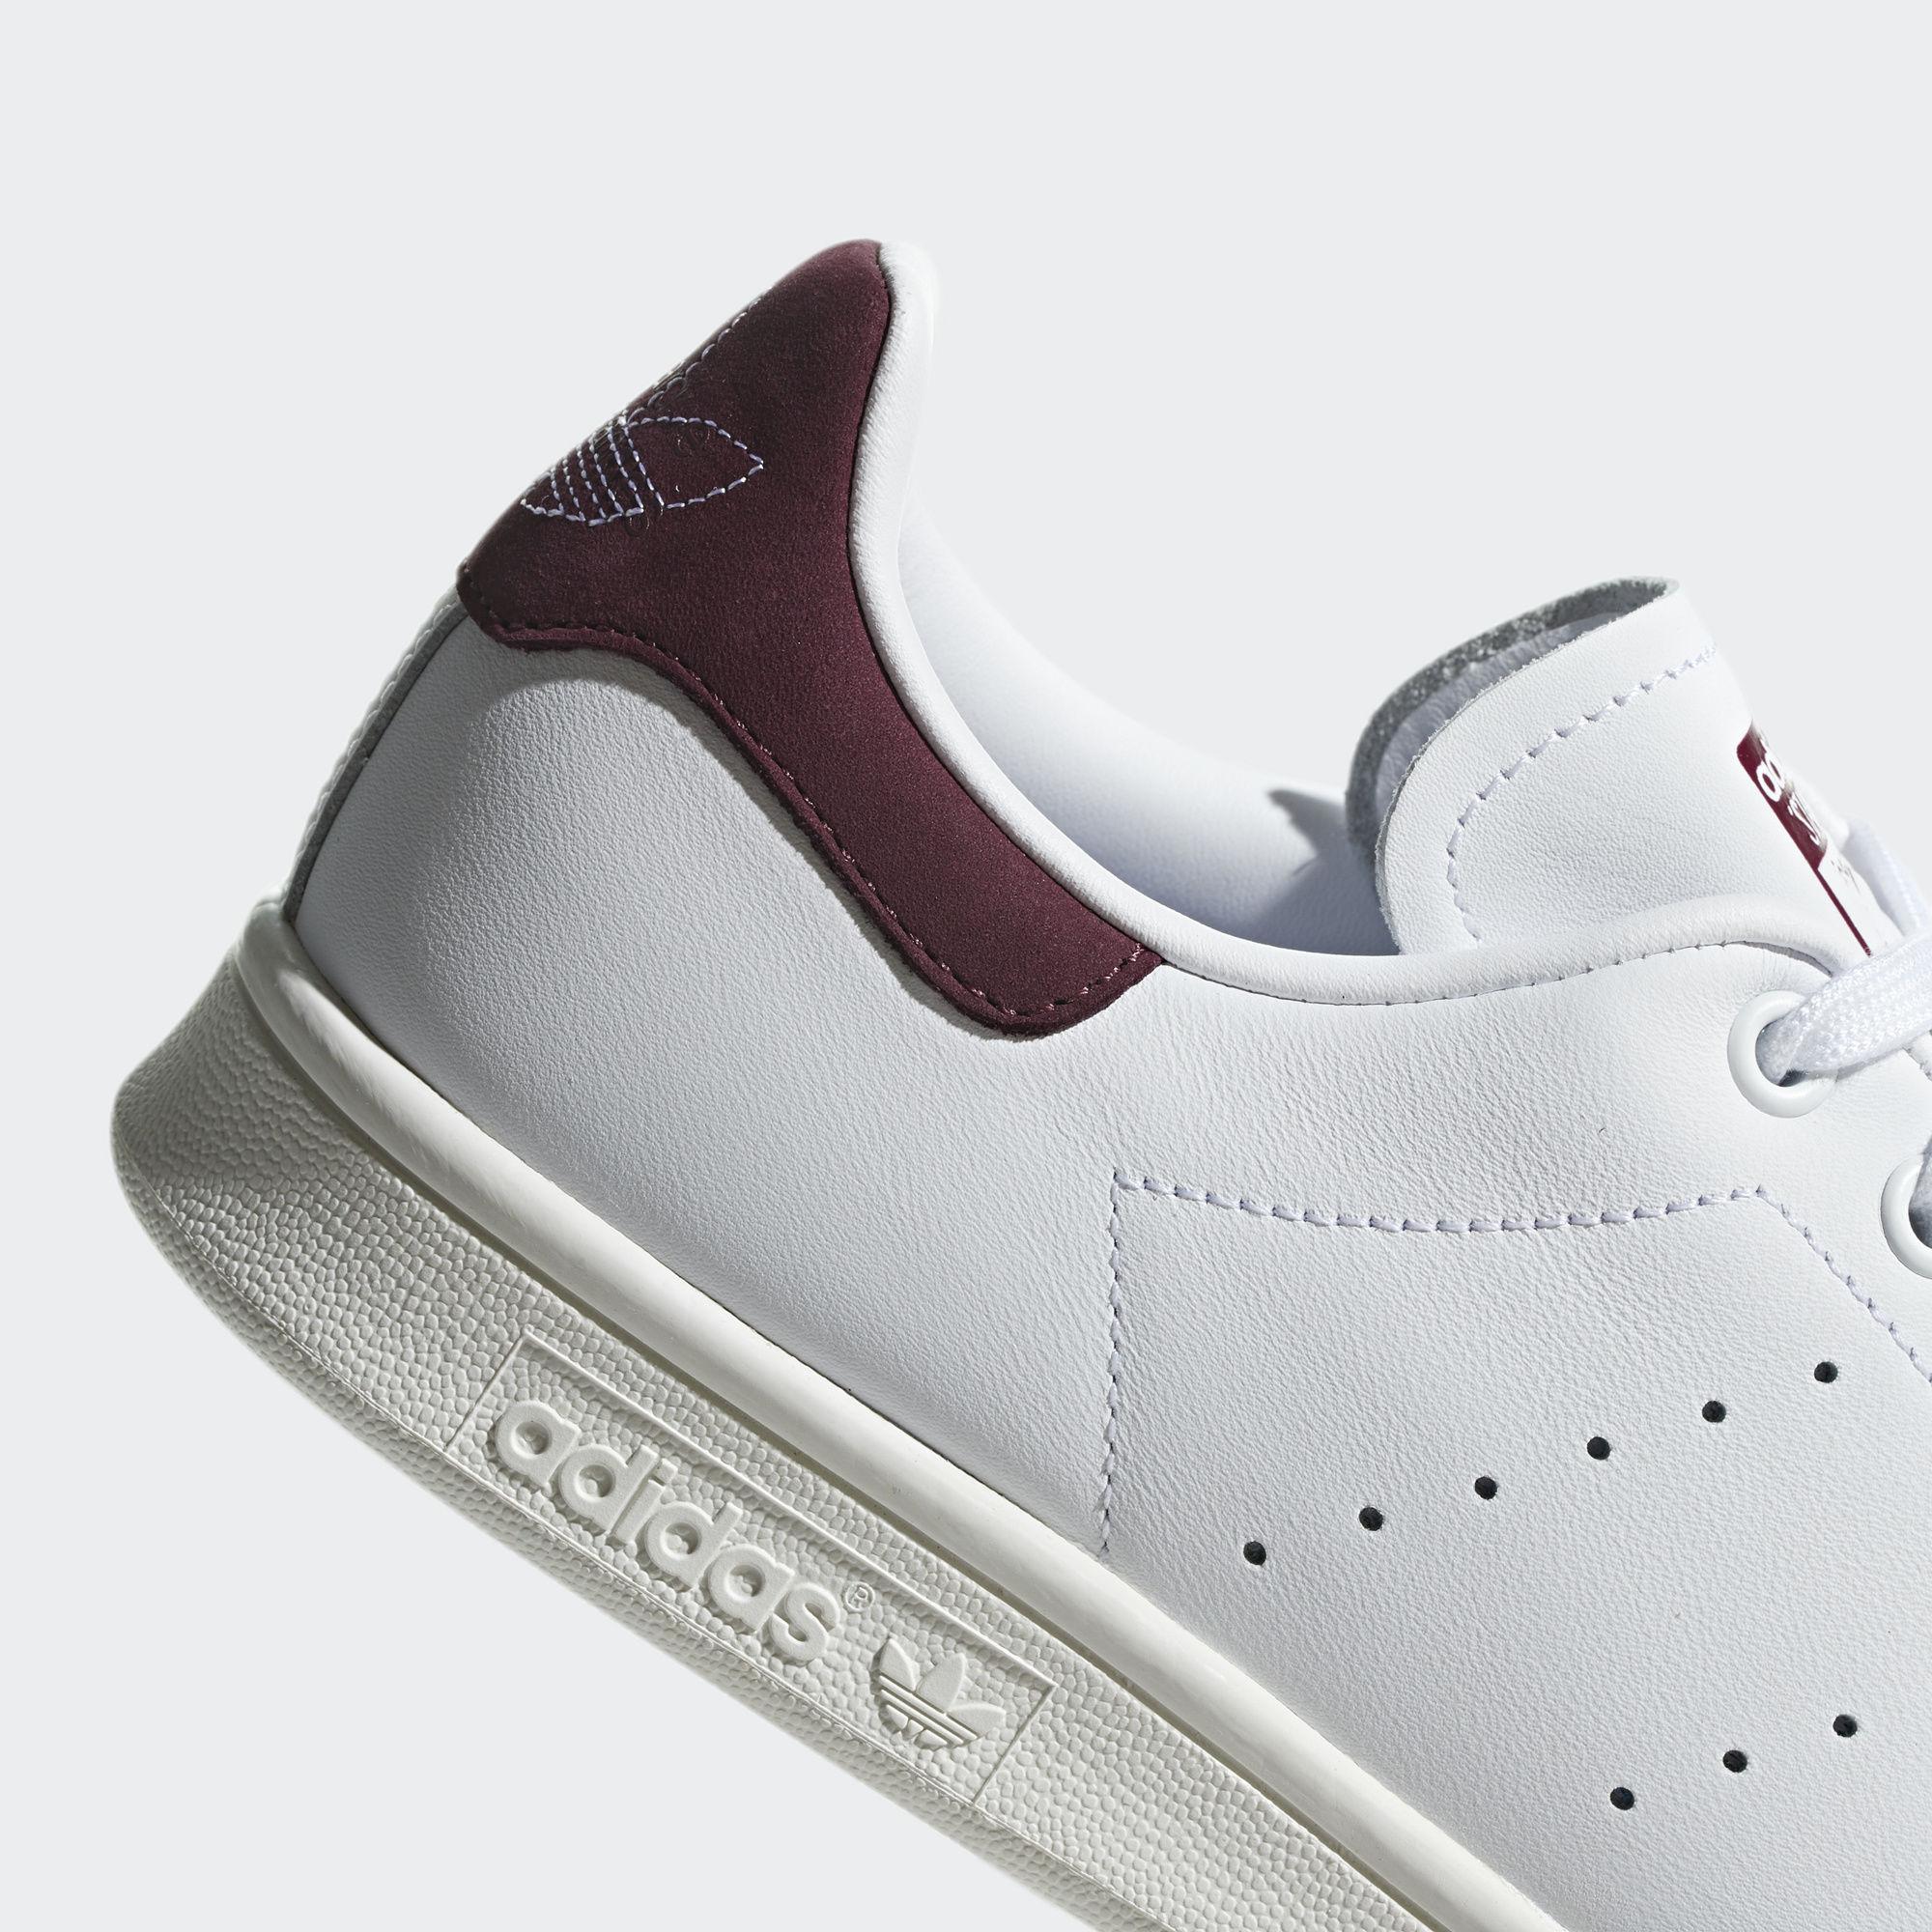 Stan Smith DB3526 Adidas Originals